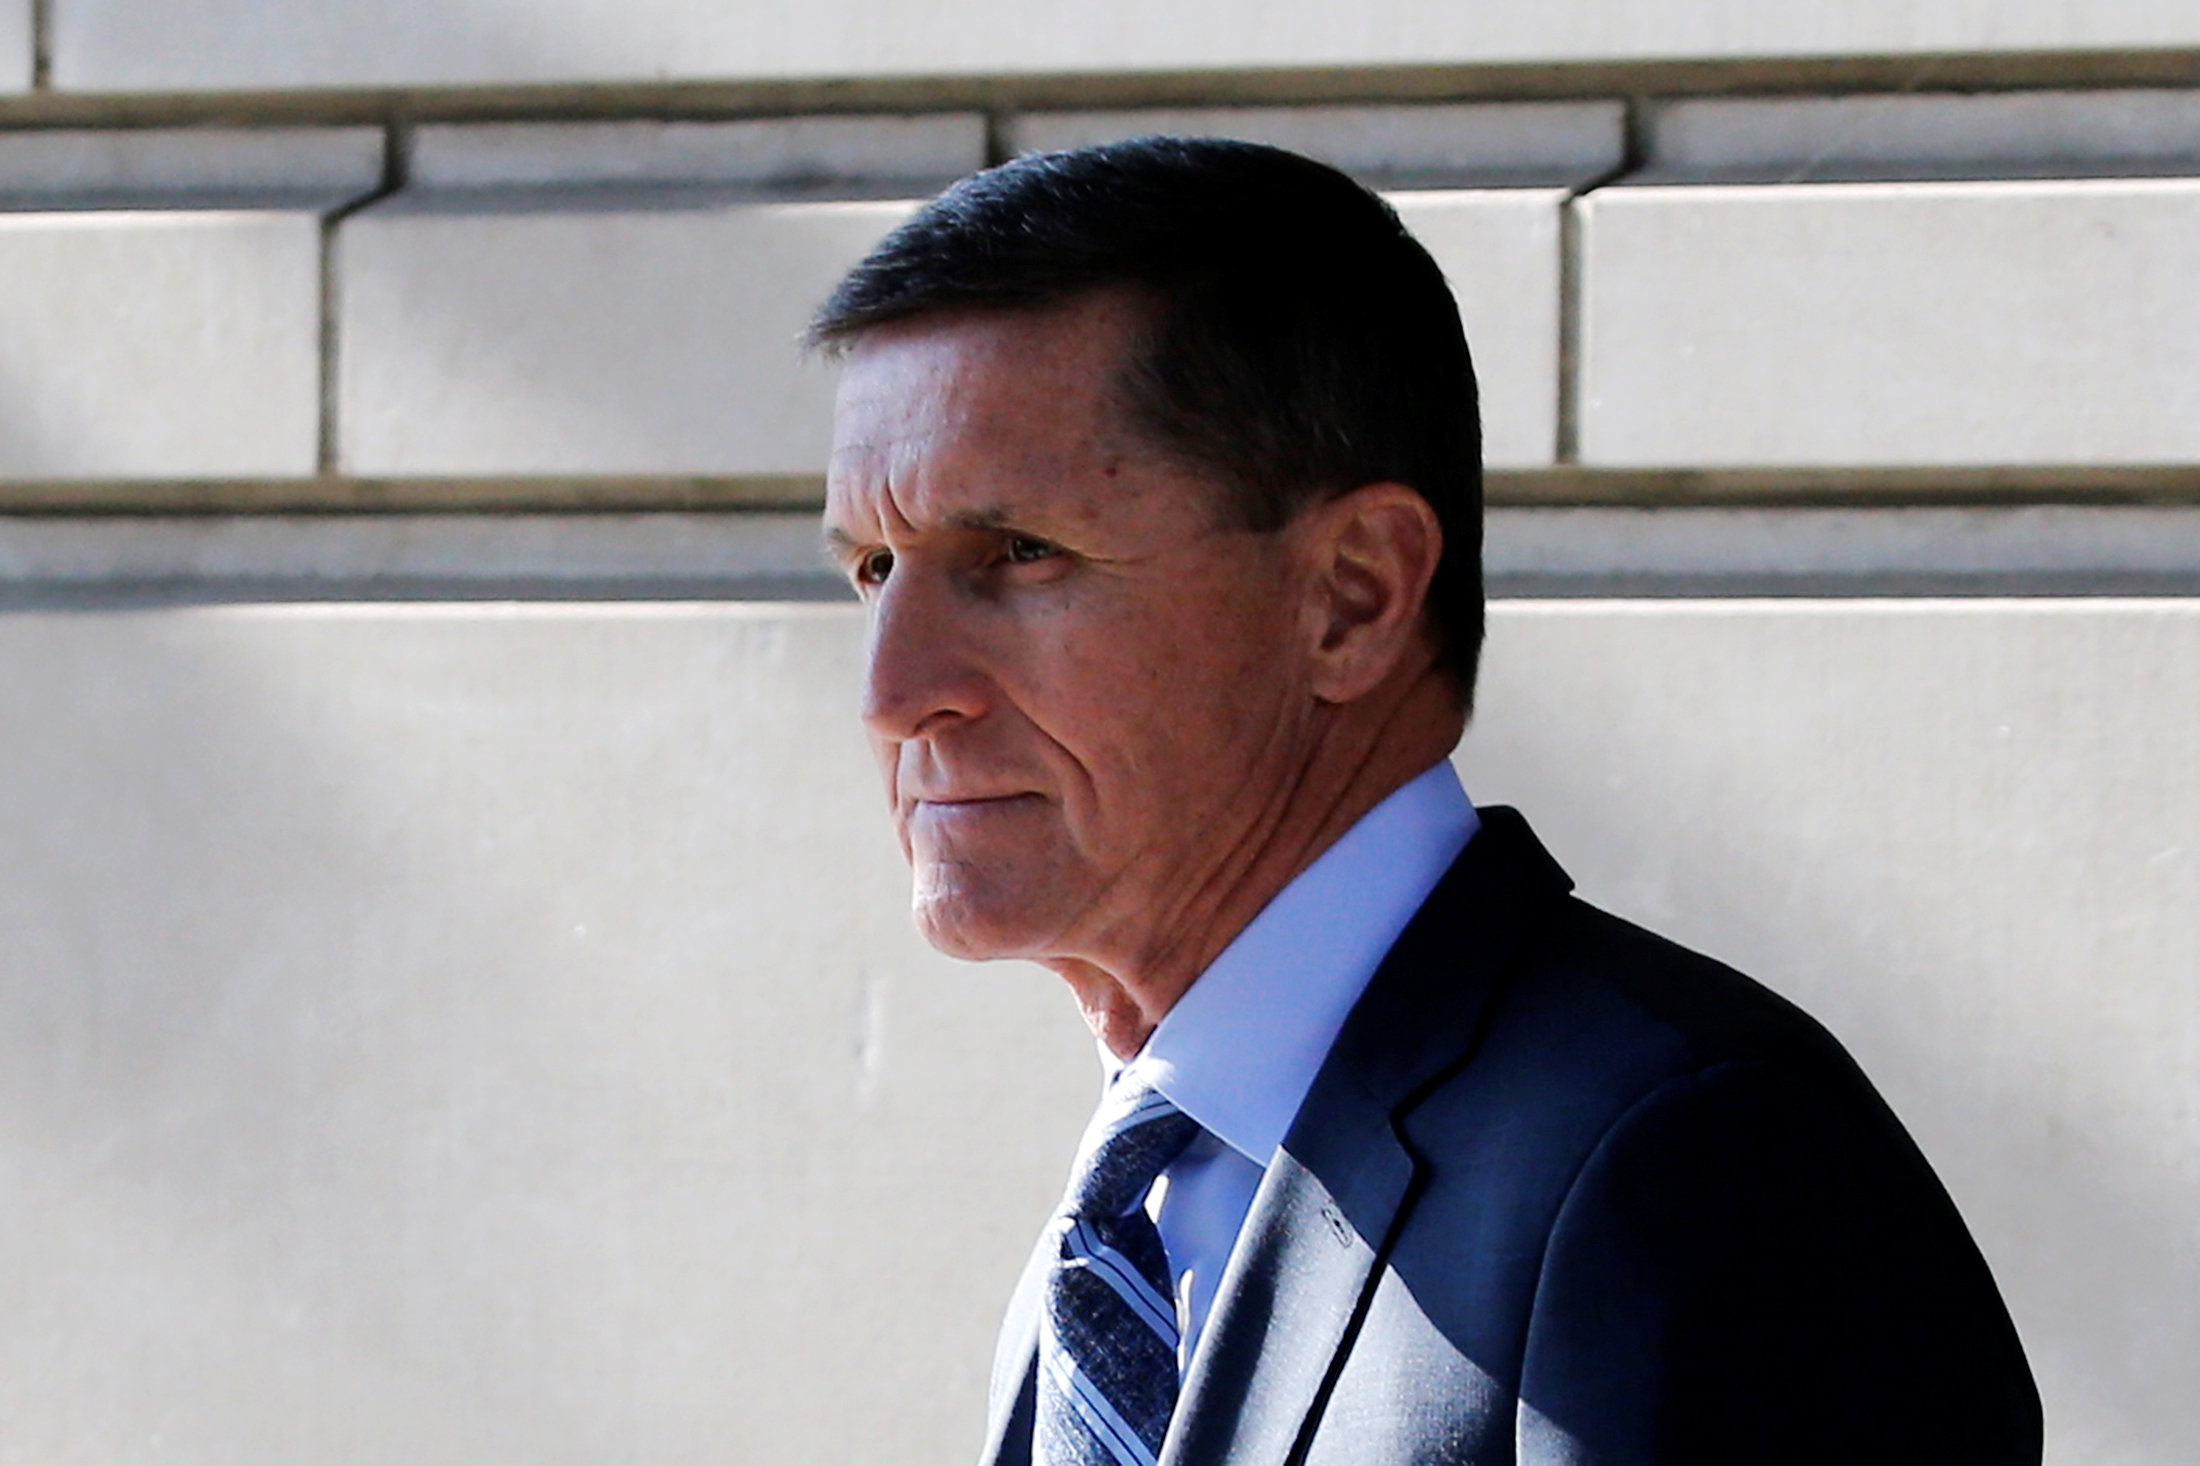 Michael Flynnen Washingtonen 2017. (REUTERS/Jonathan Ernst/archivo)